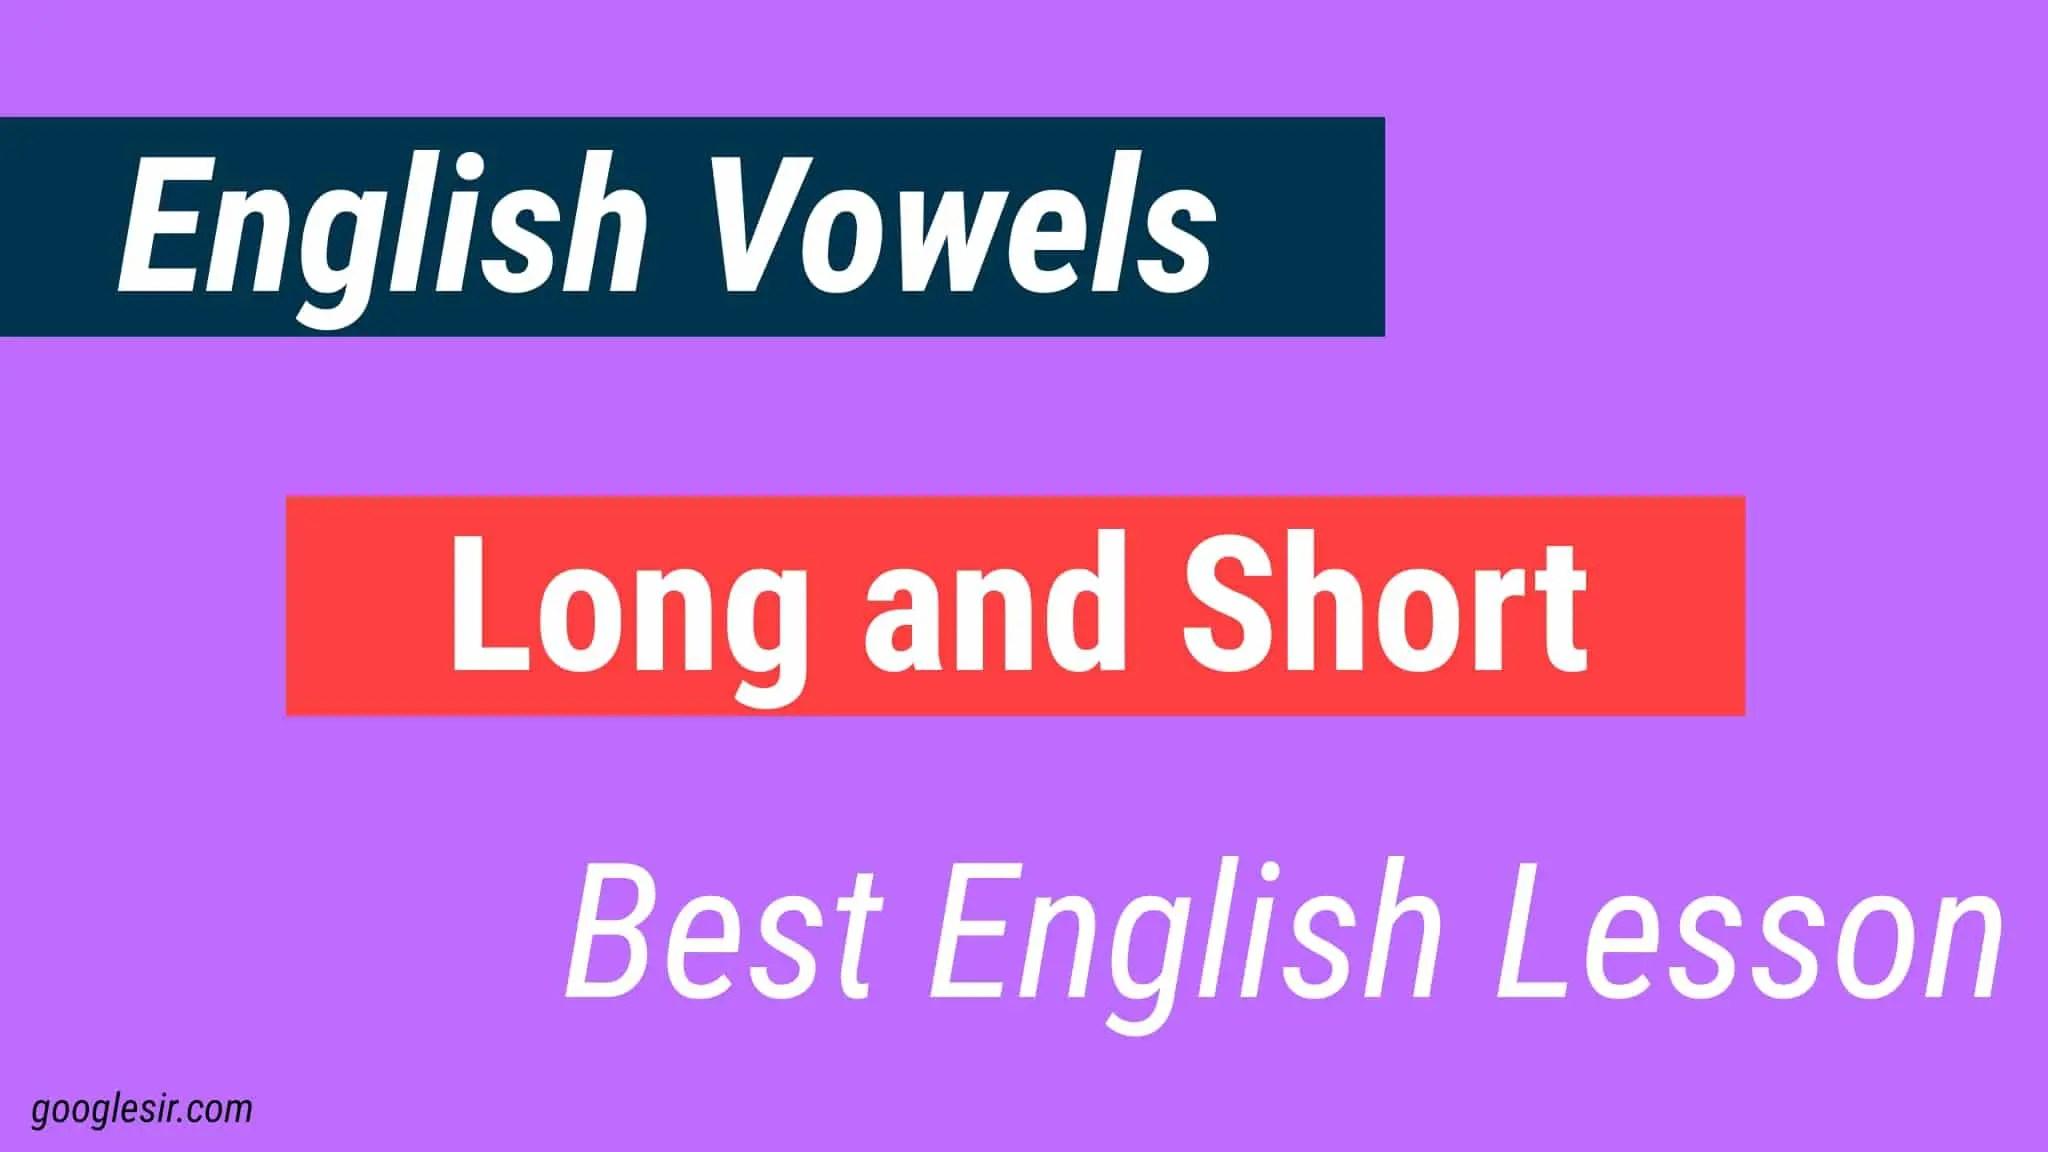 English Vowels